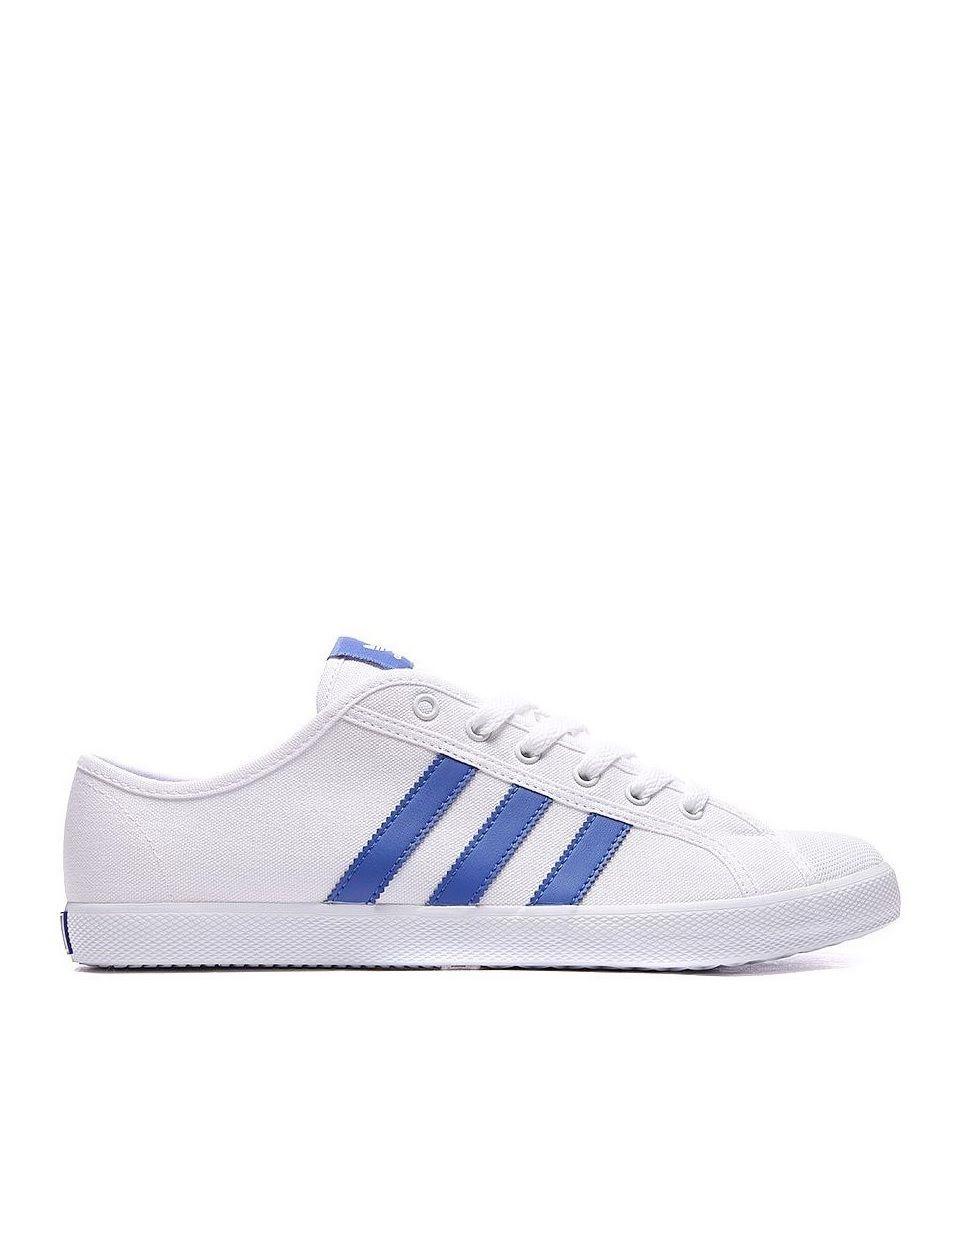 41b666ea4b3c adidas Originals San Remo Nike Shoes